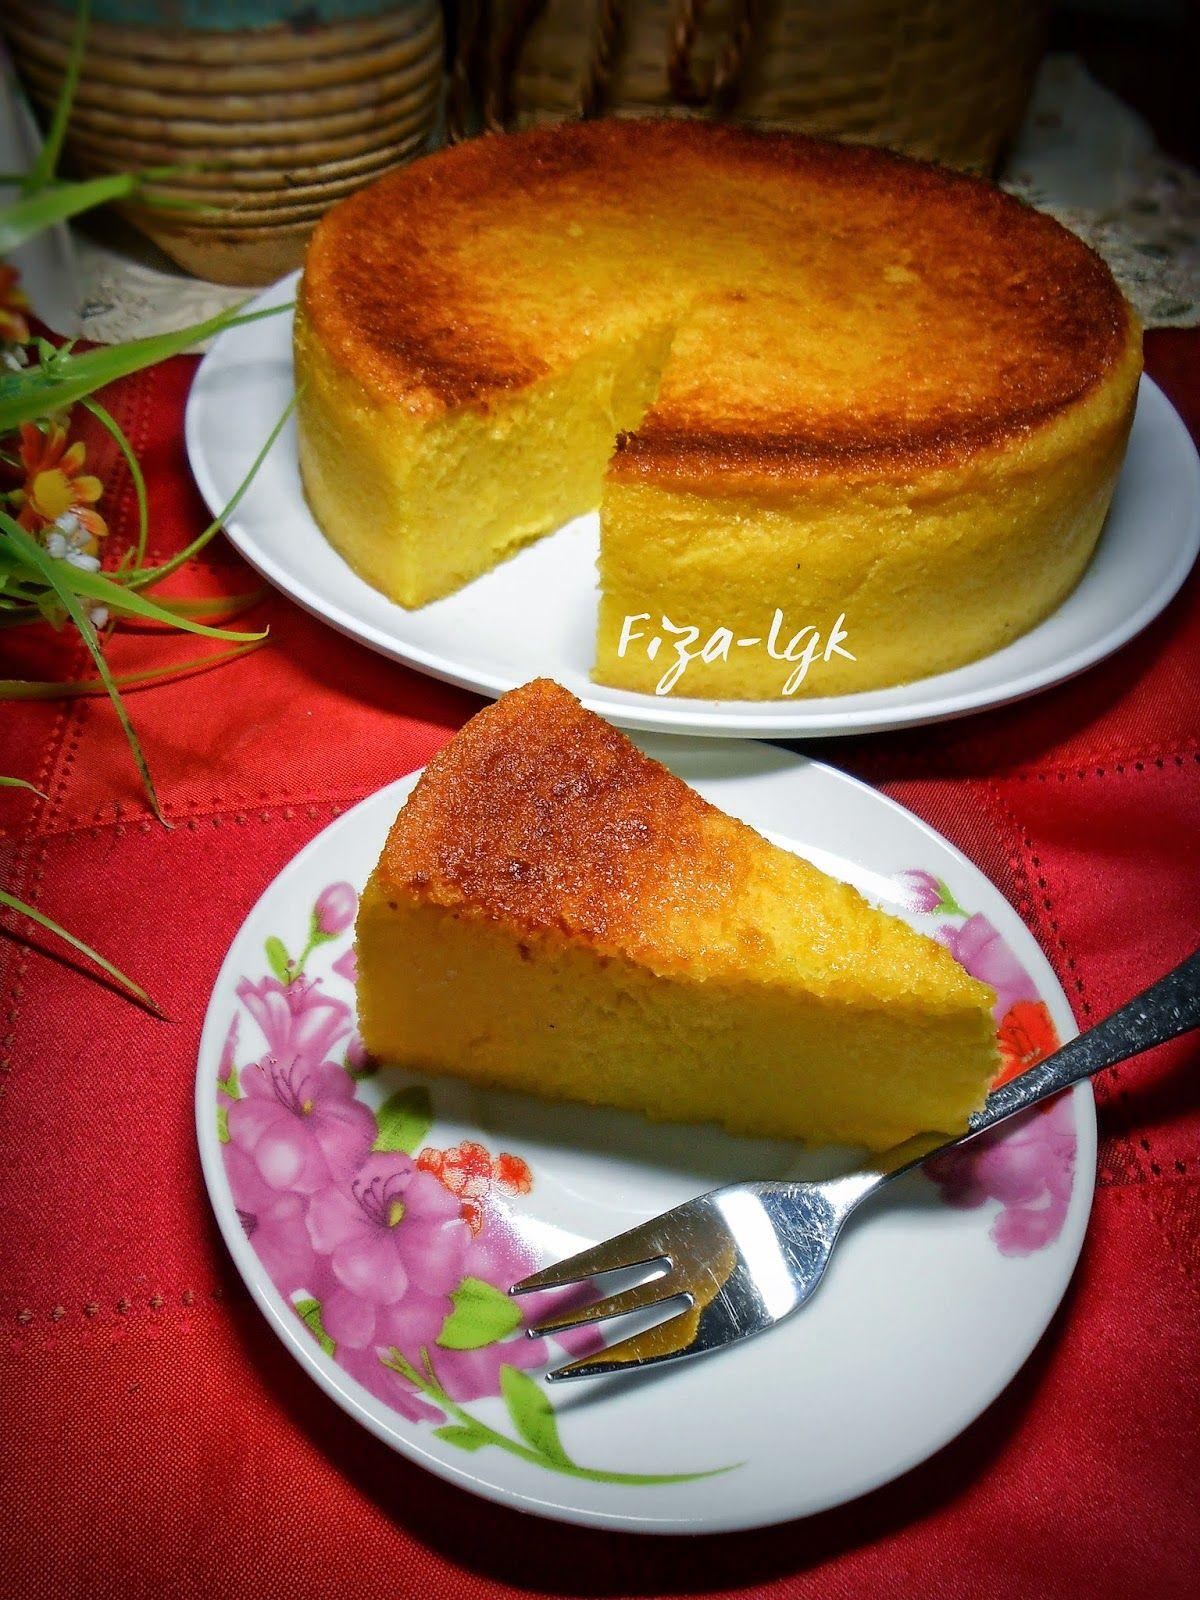 Bingka Ubi Kayu Cheese Fiza S Cooking Resep Makanan Penutup Resep Masakan Makanan